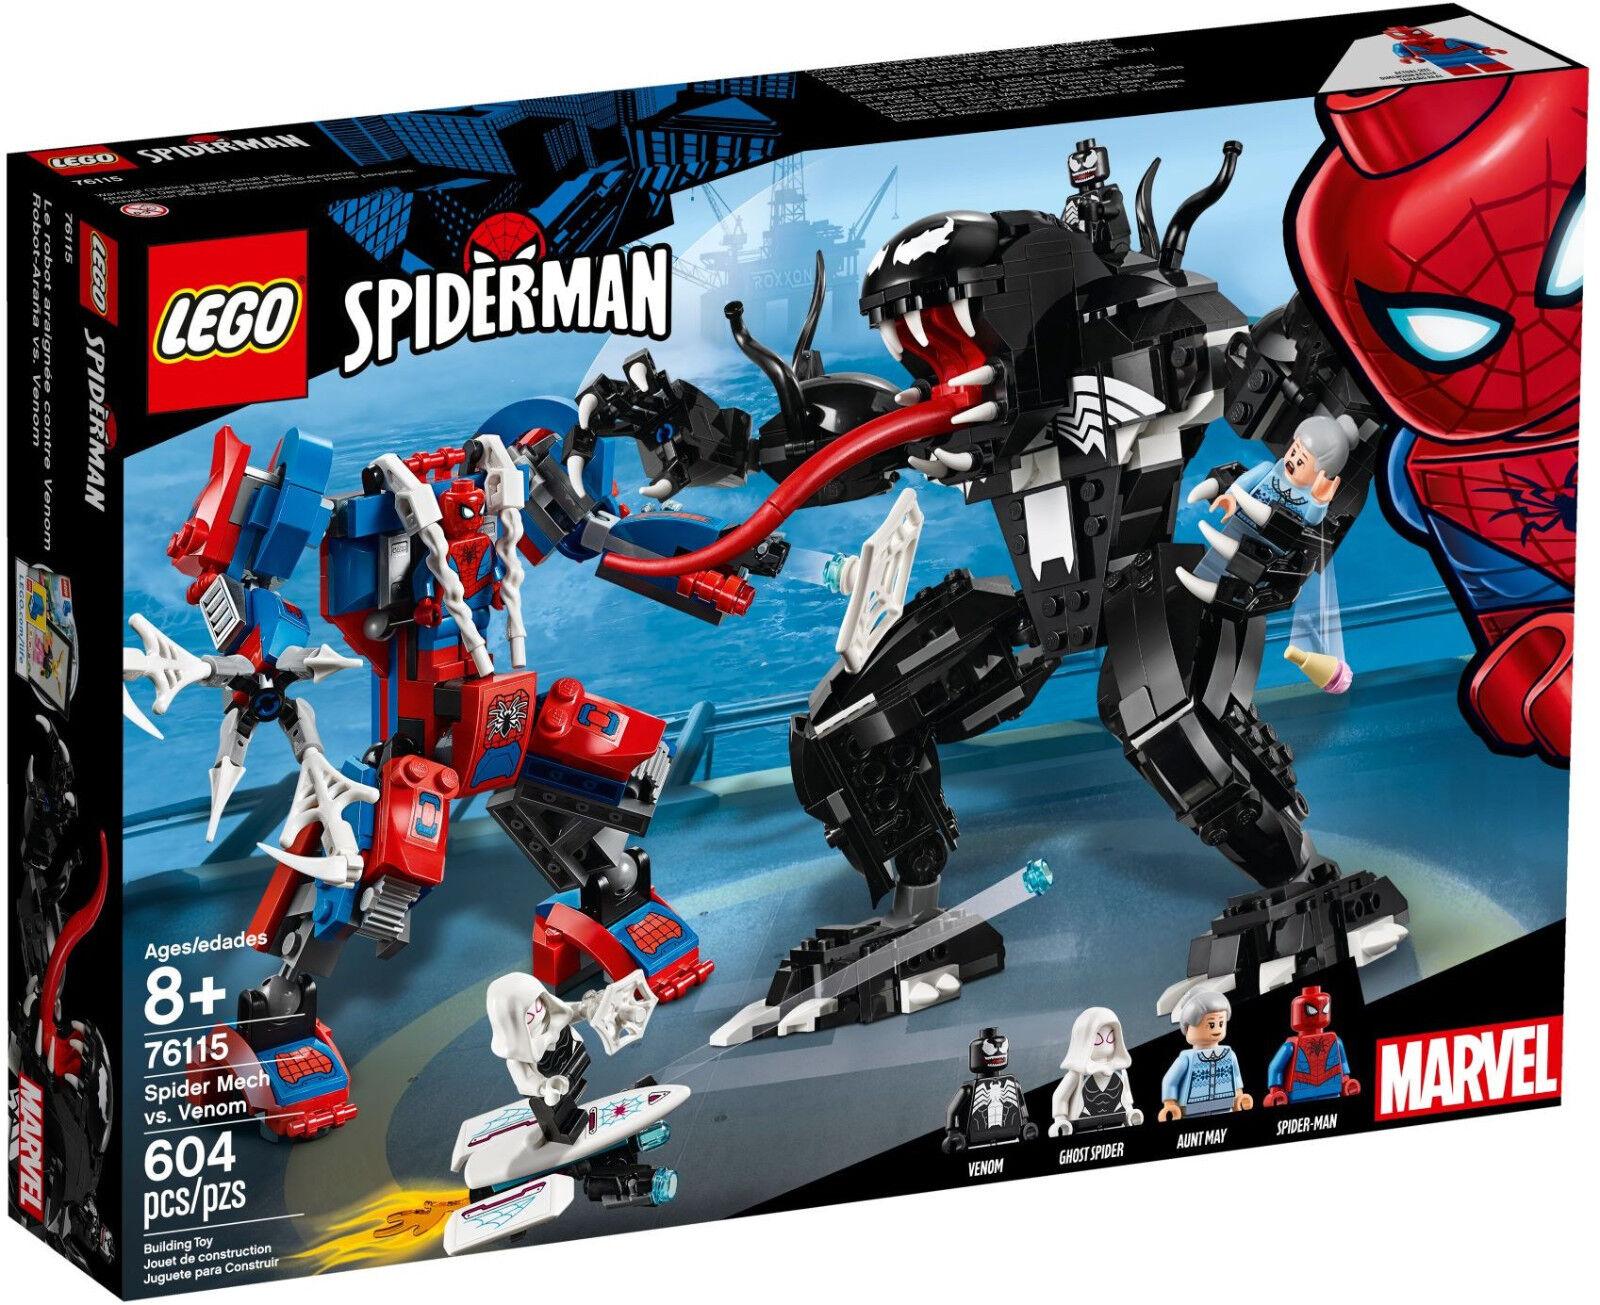 LEGO Marvel Superheroes  - 76115 SPIDER Mech vs. Venom-NUOVO & OVP  sconto di vendita